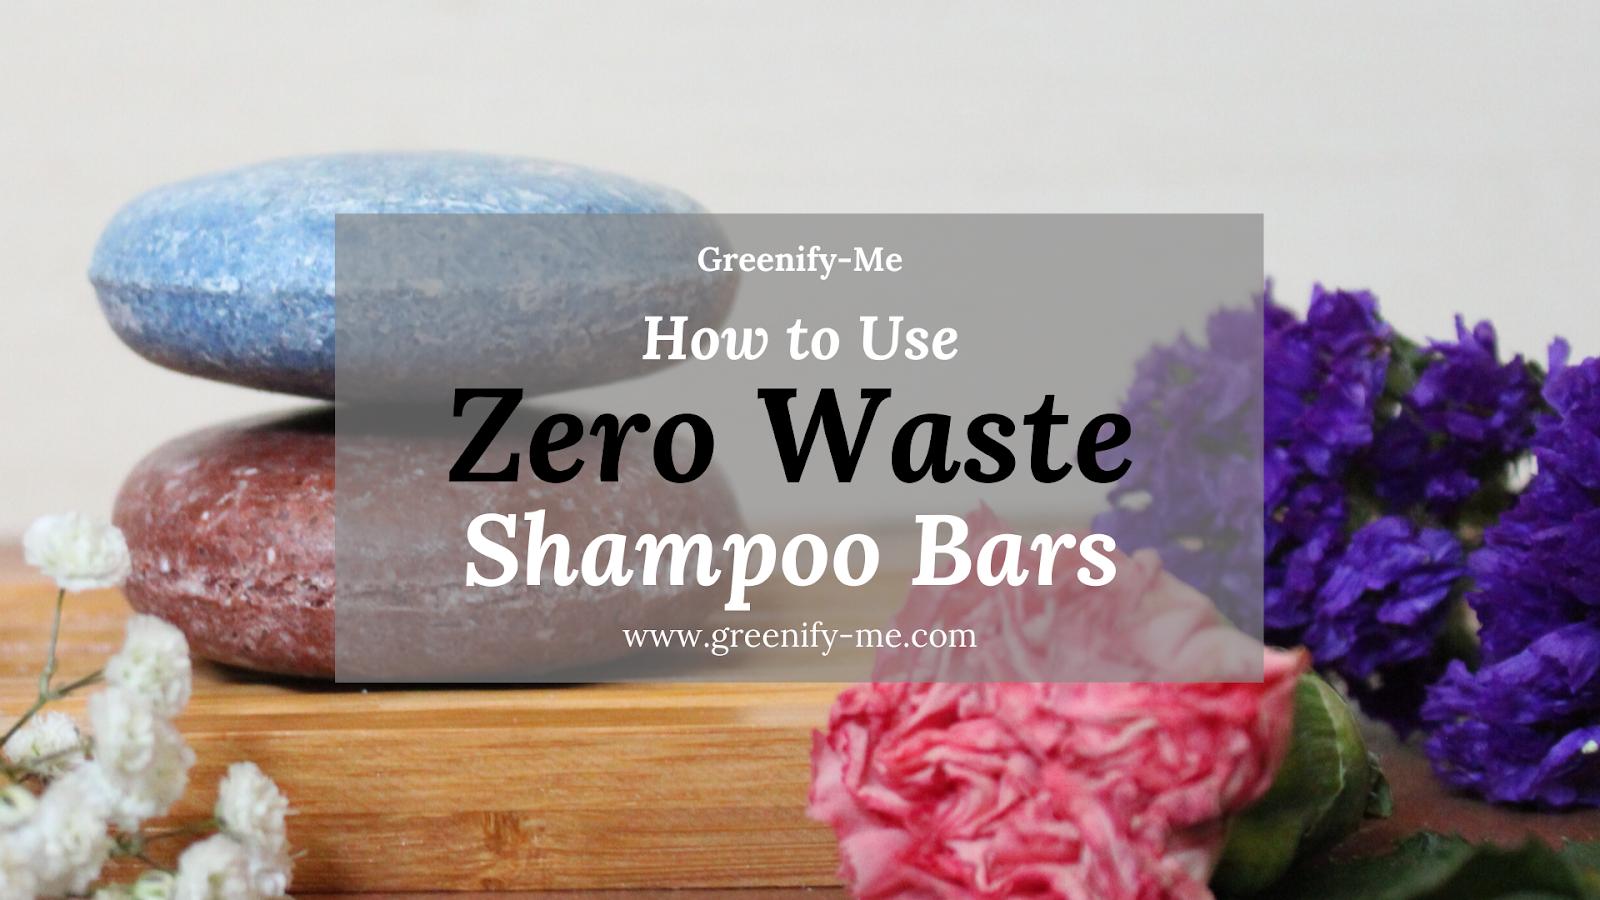 Zero Waste Shampoo Bars